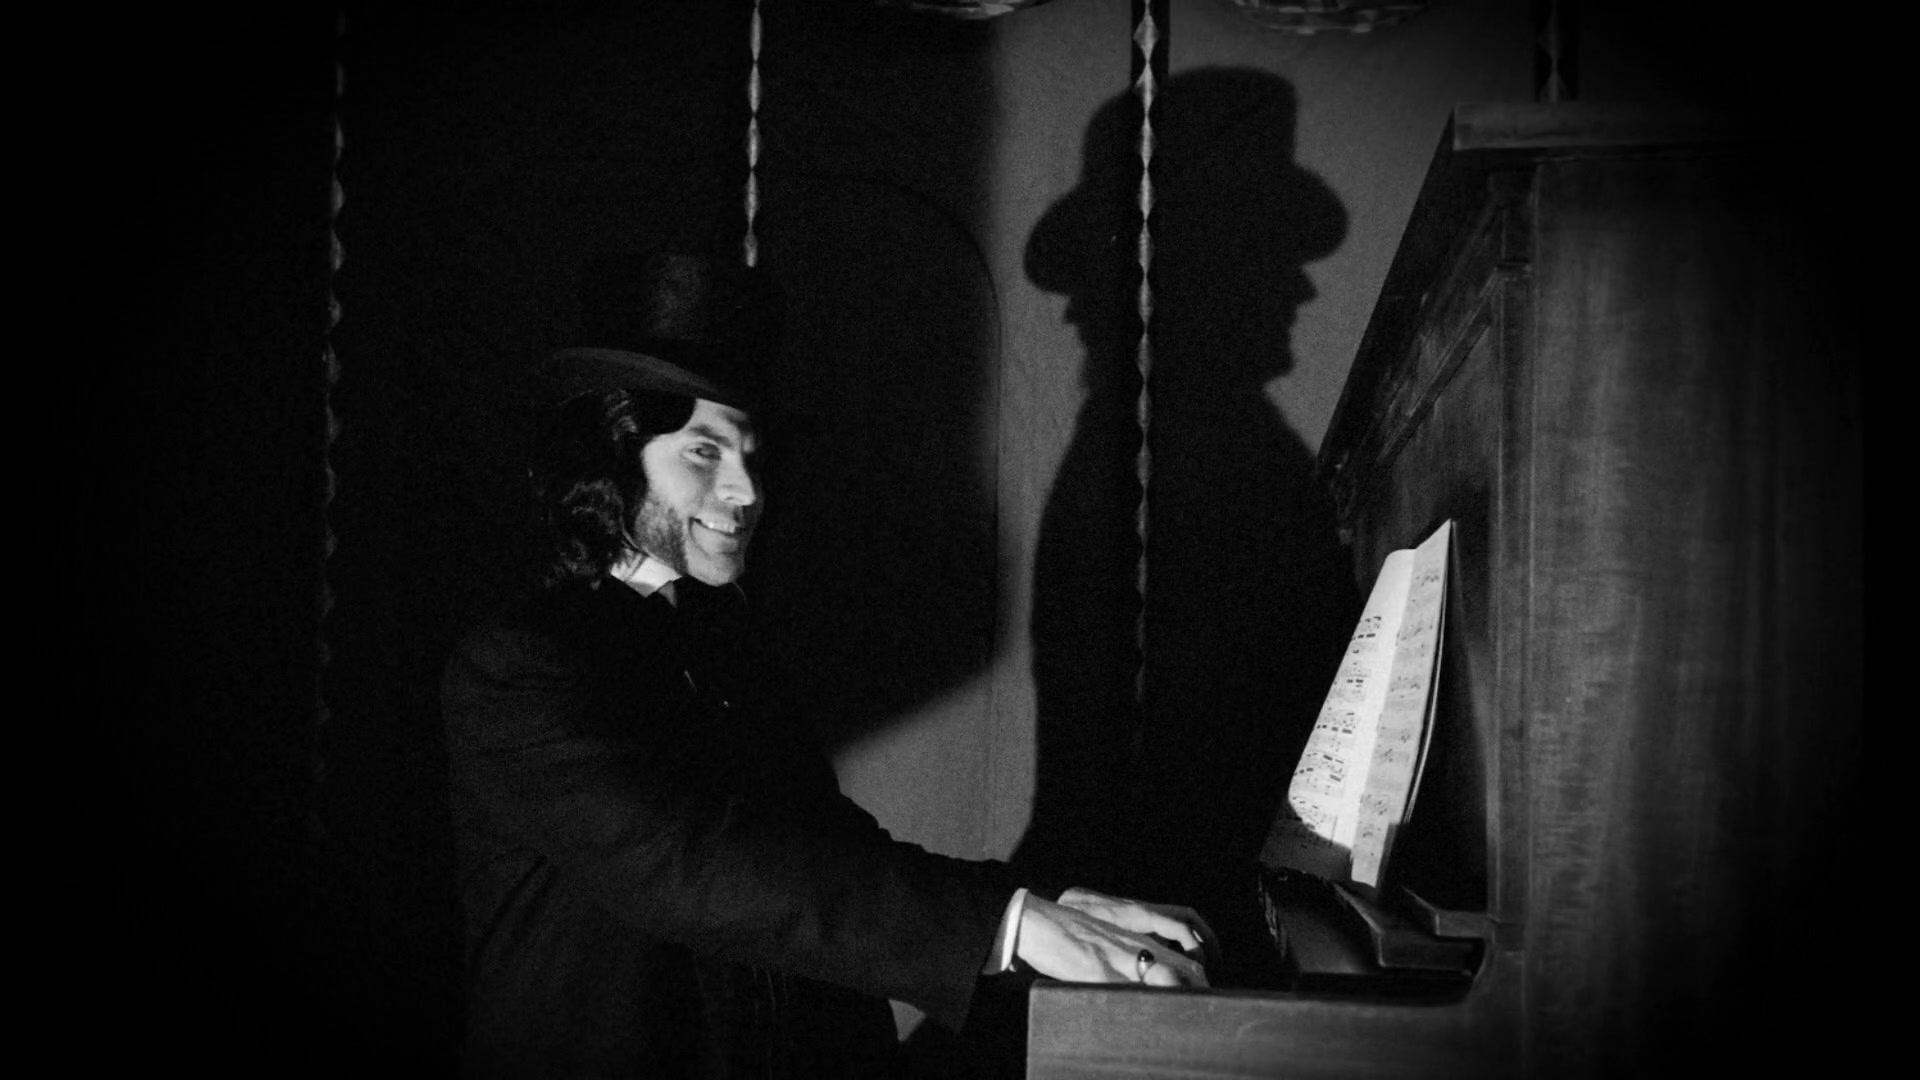 S04E03 Mordrake playing piano.jpg